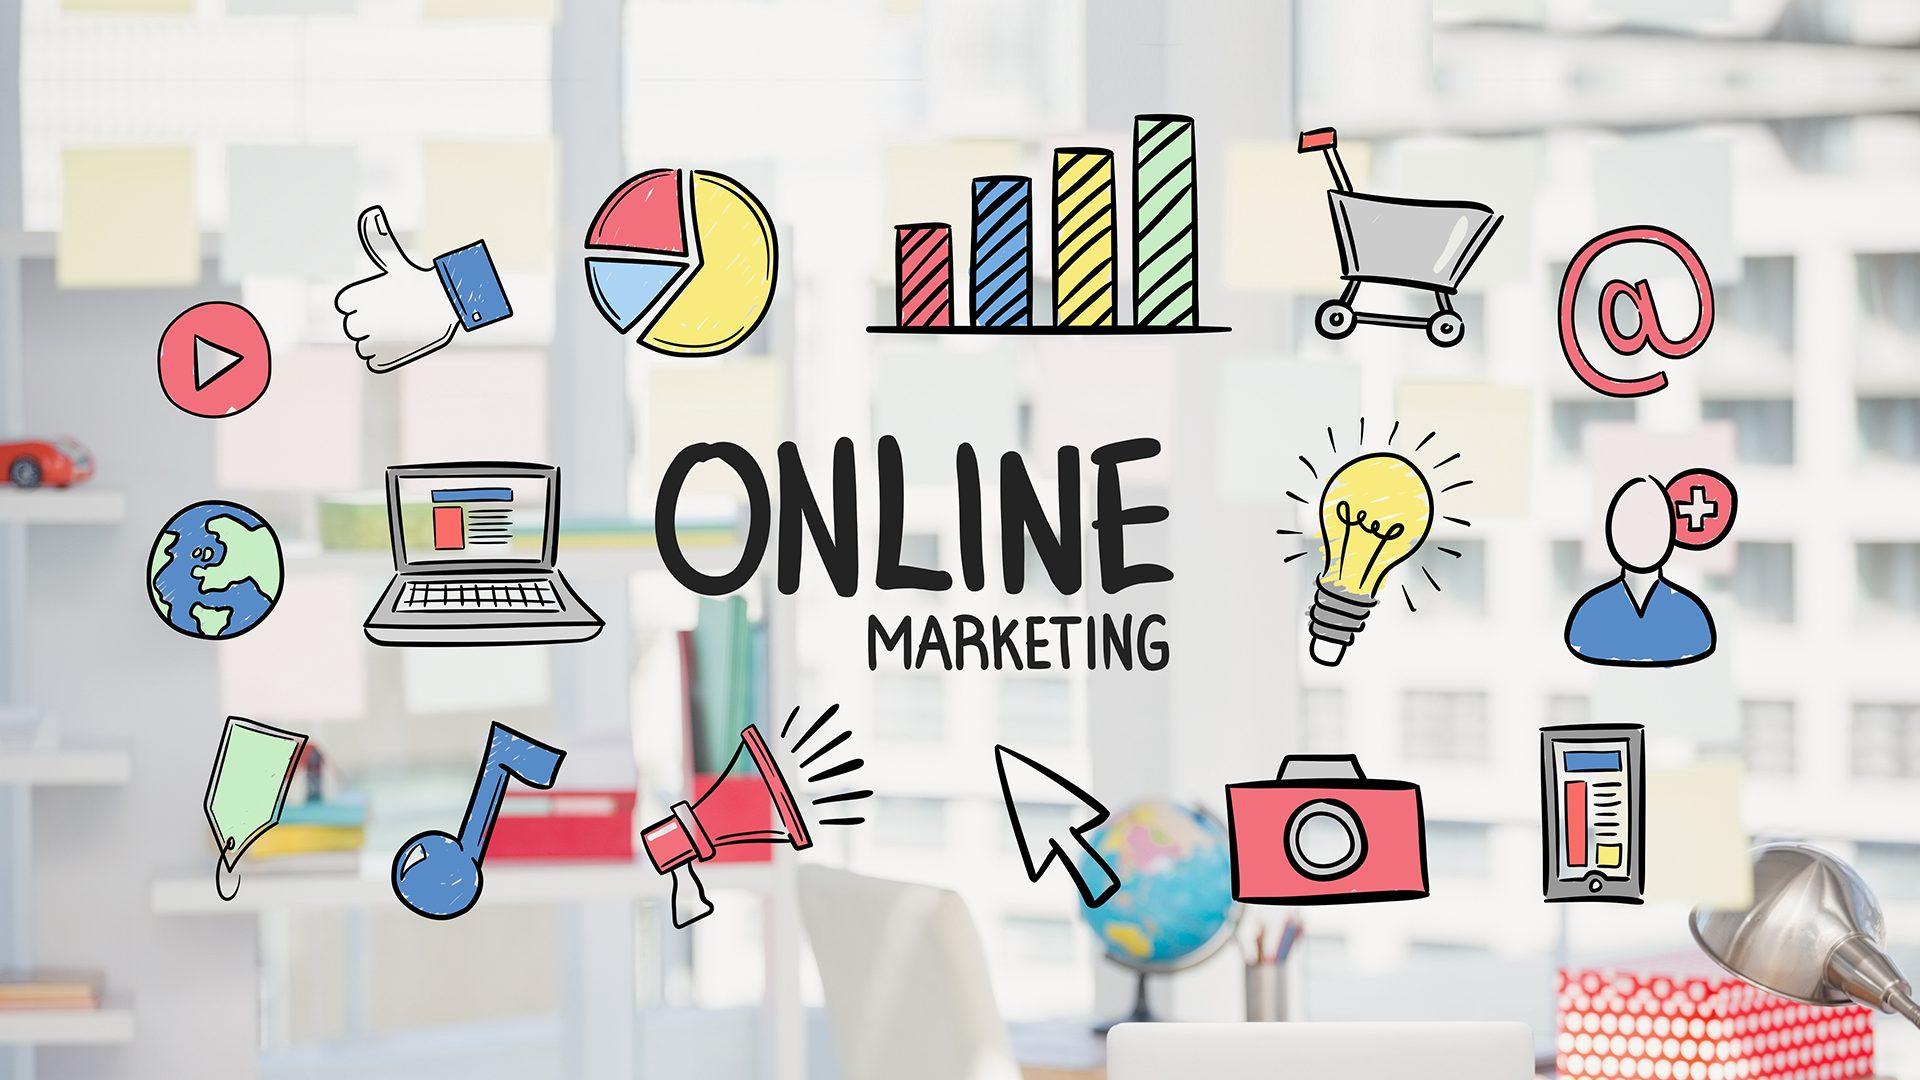 Jasa Internet Marketing Yogyakarta Biaya Terjangkau